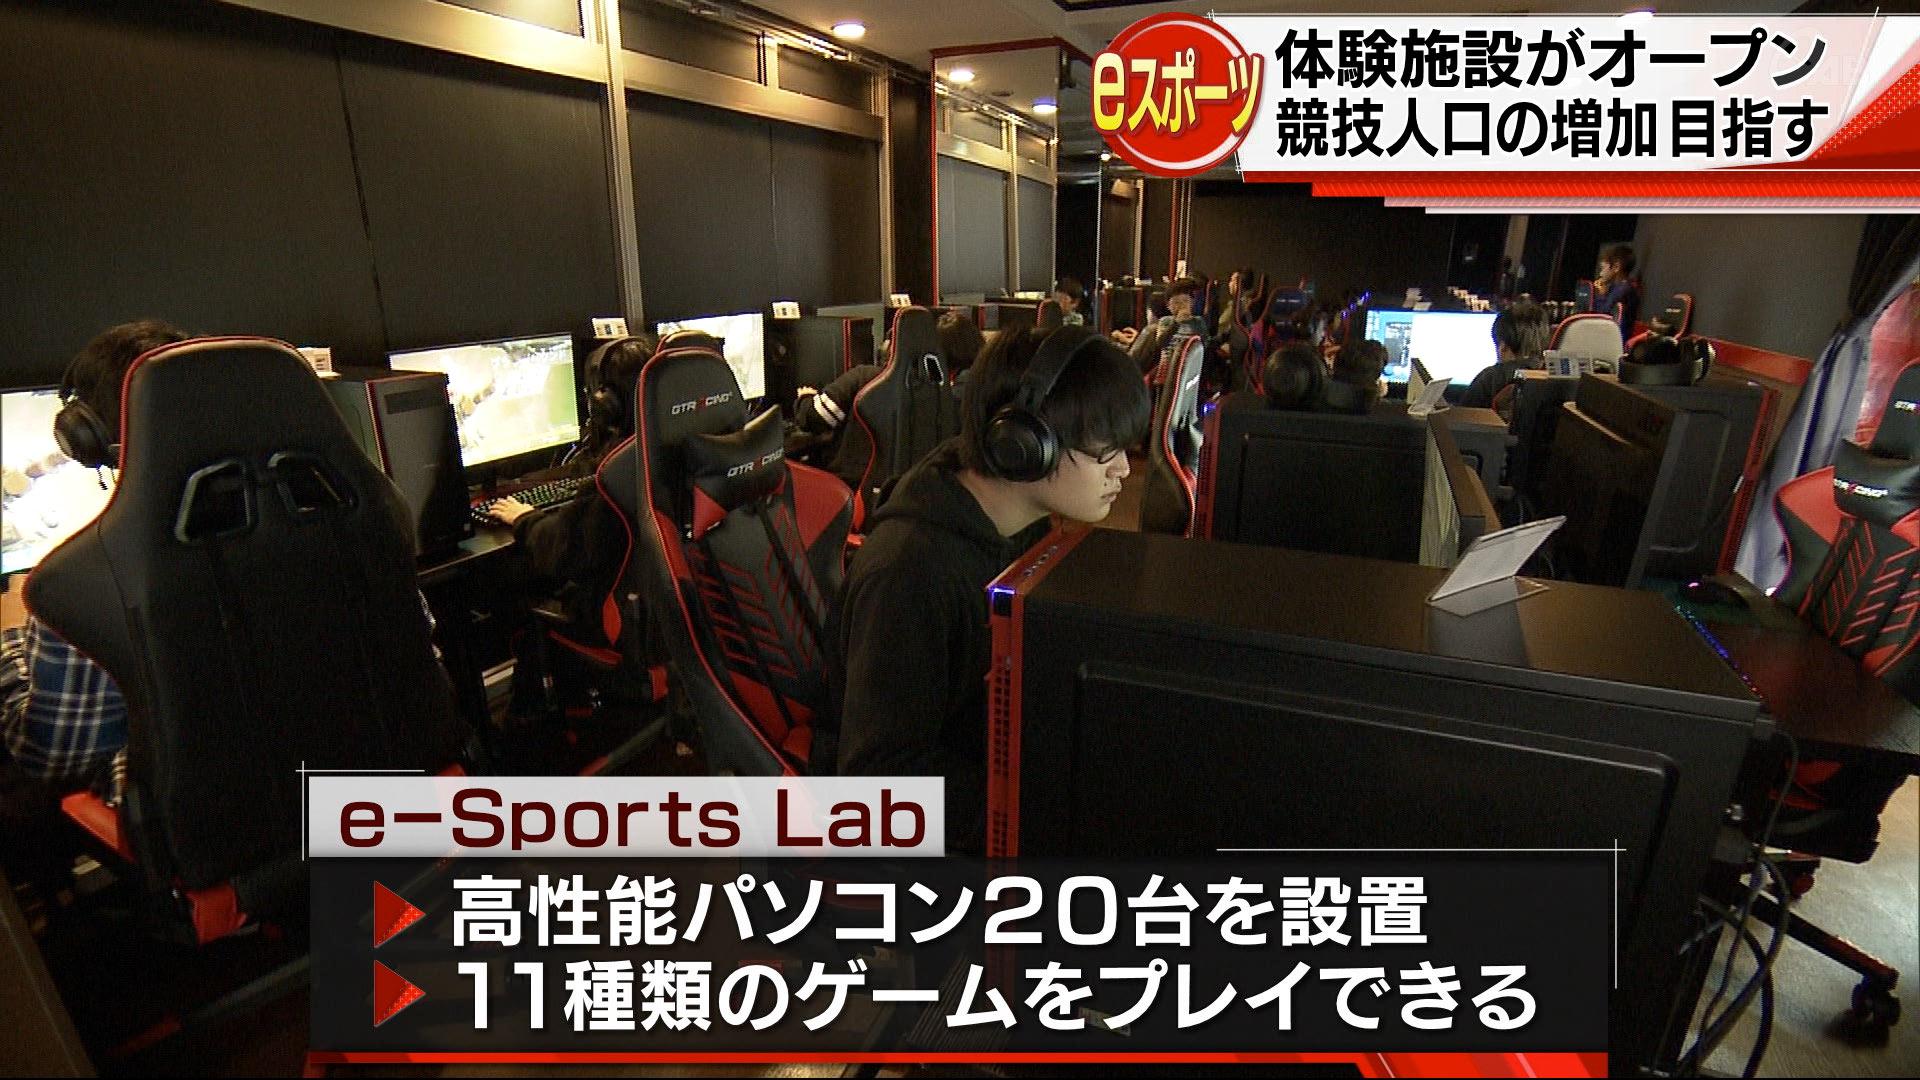 e-Sports Lab 那覇市にオープン